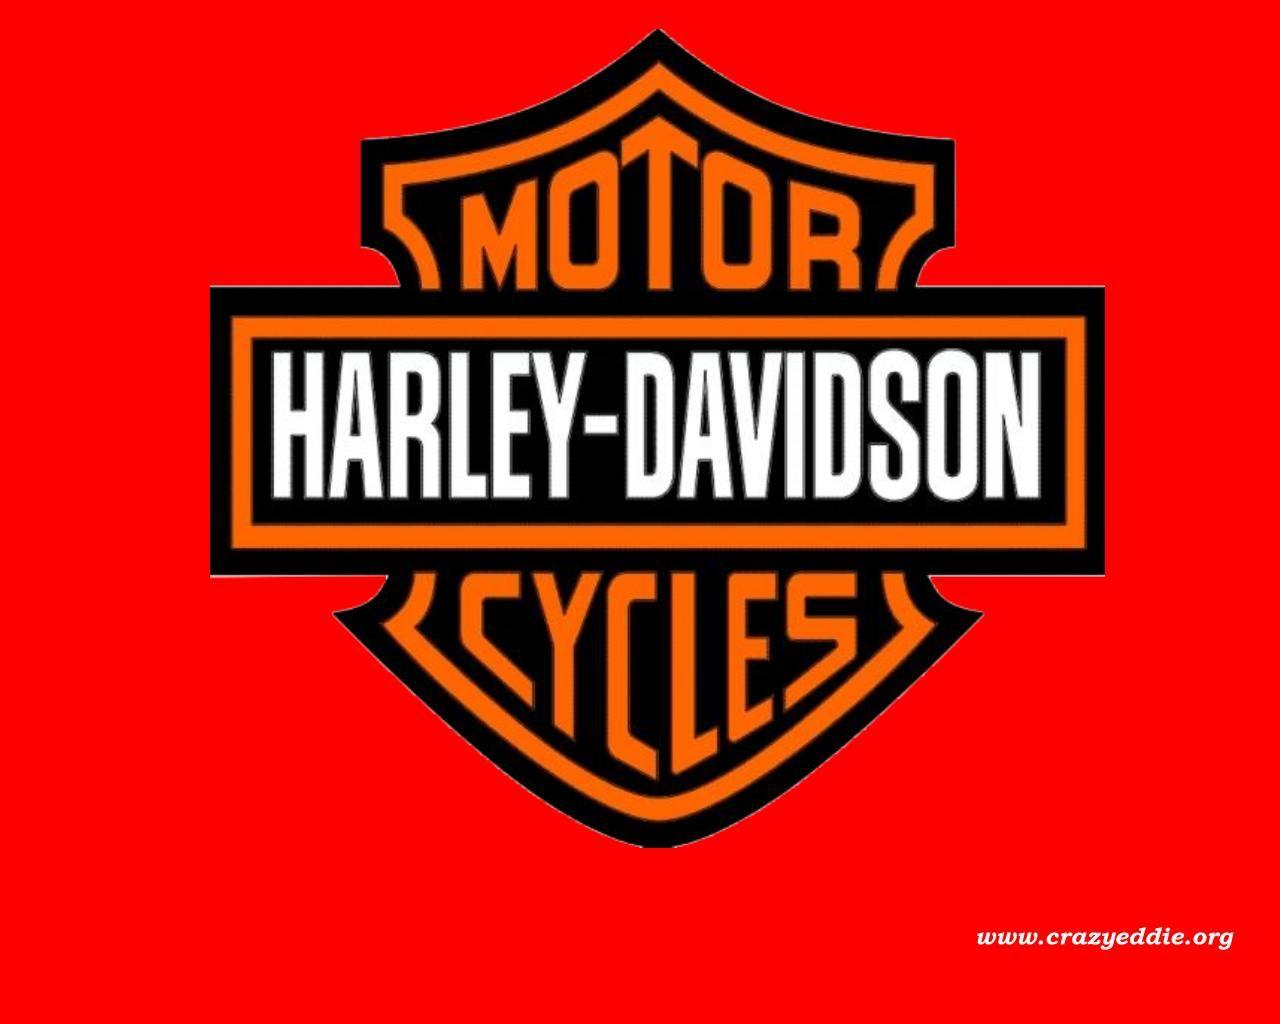 HARLEYDAVIDSON WALLPAPER HD Wallpaper Pinterest Harley - Stickers for motorcycles harley davidsonsbest harley davidson images on pinterest